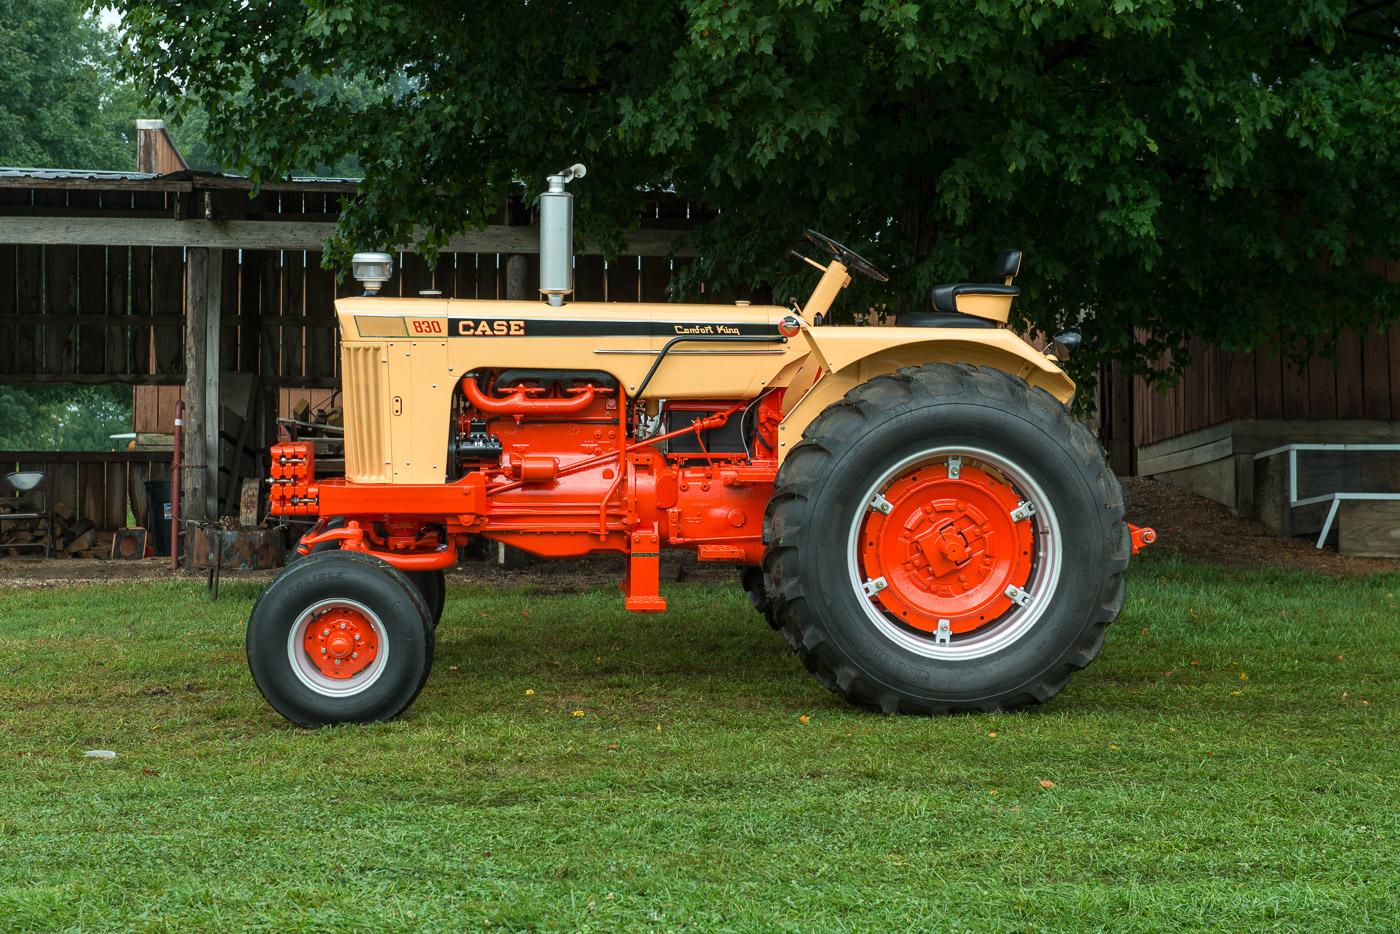 1968 Case Model 830